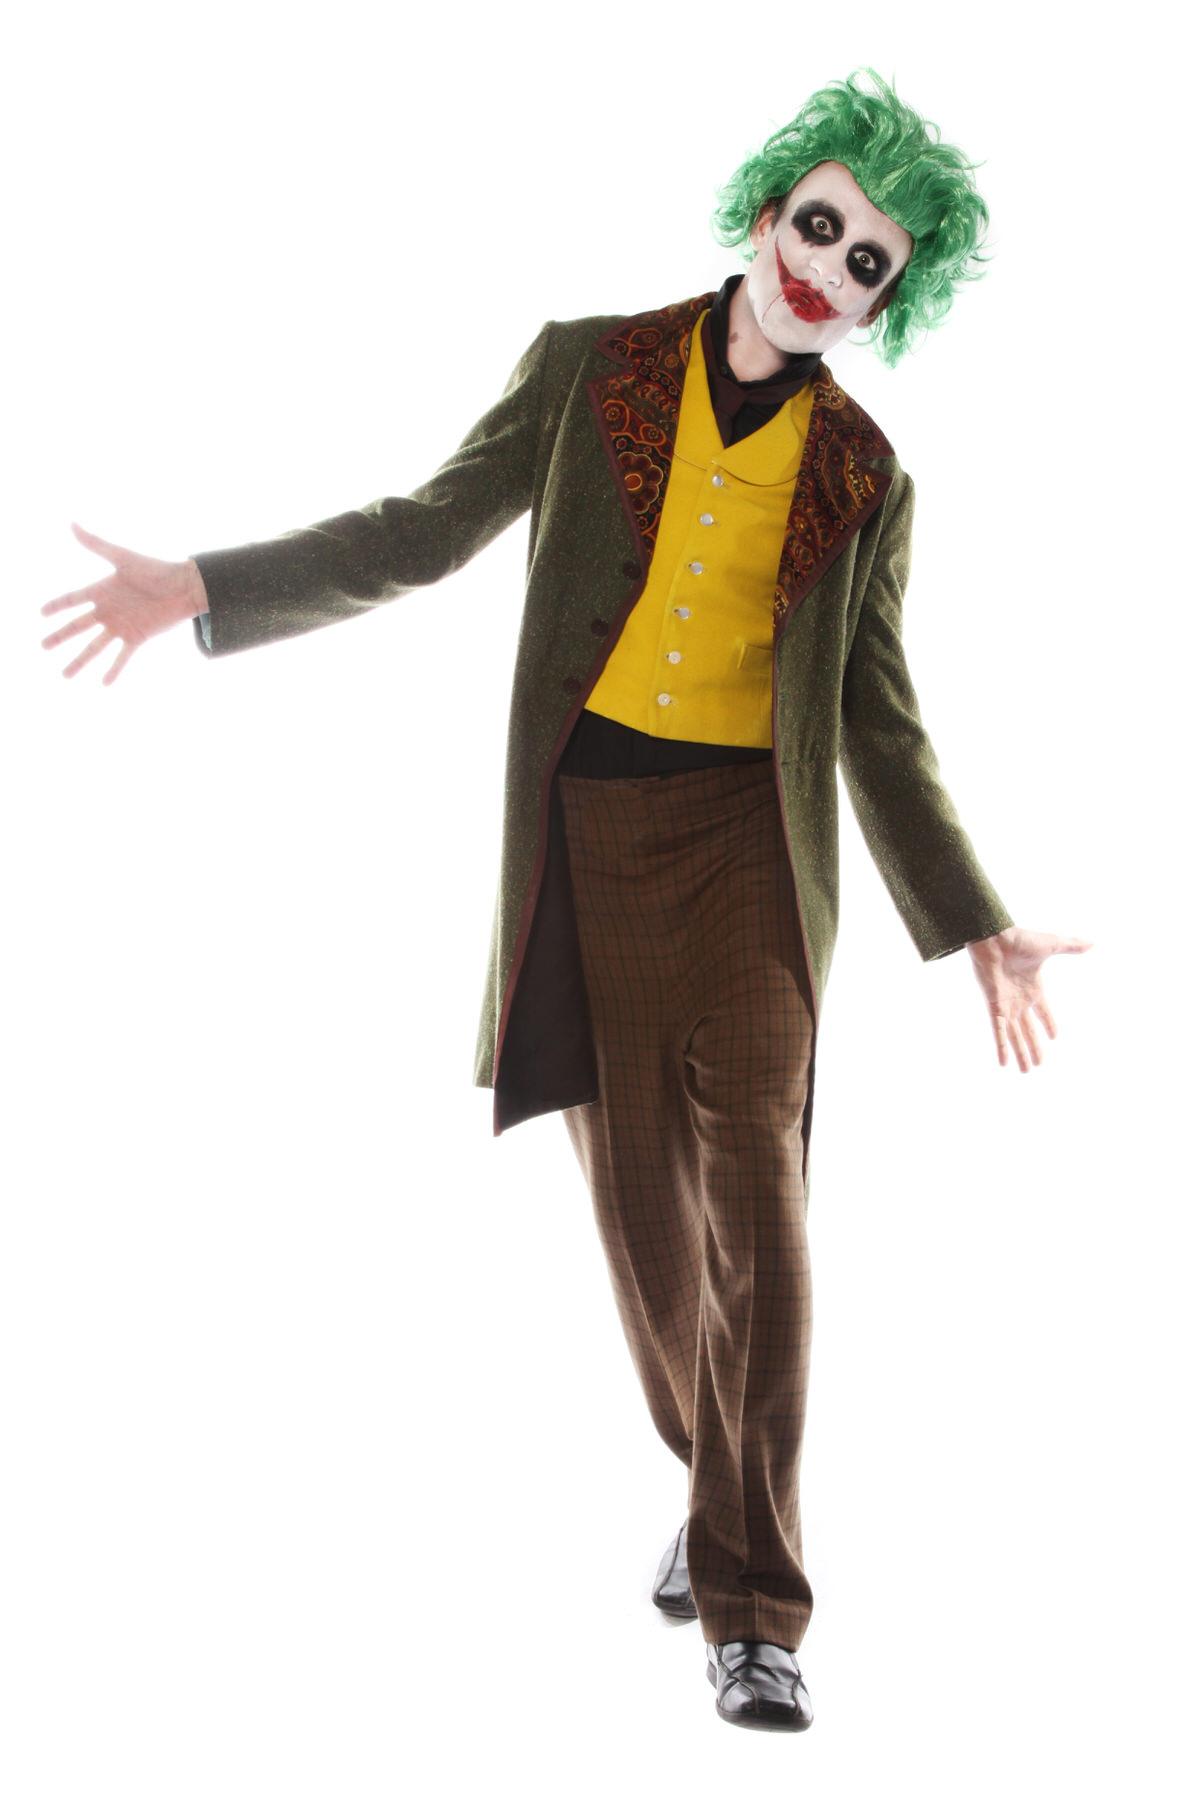 JOKER VILLAIN STYLE COSTUME W GREEN WIG